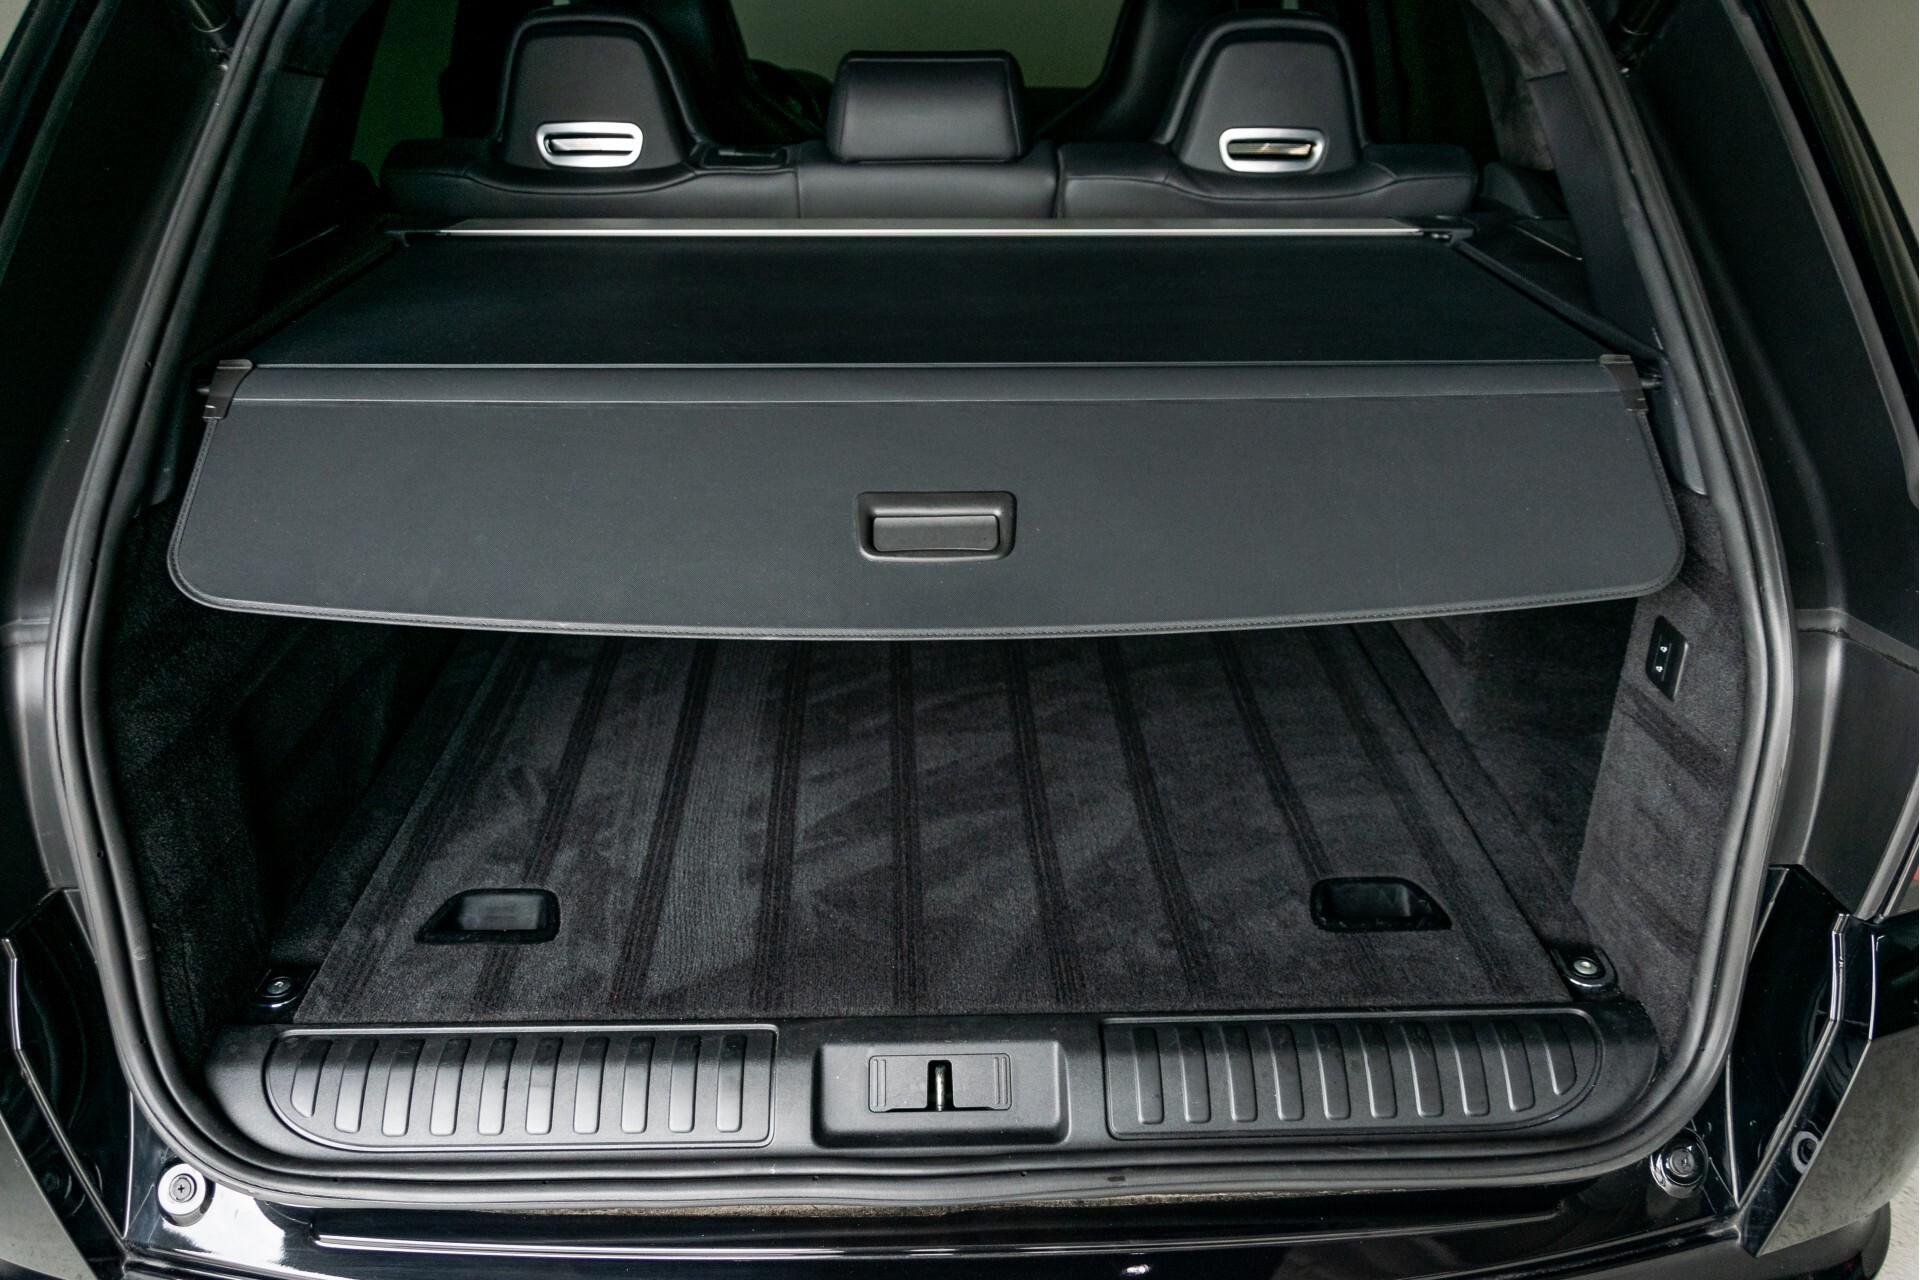 Land Rover Range Rover Sport SVR 5.0 Supercharged 575pk Full Carbon Nieuwprijs €241377 Foto 55